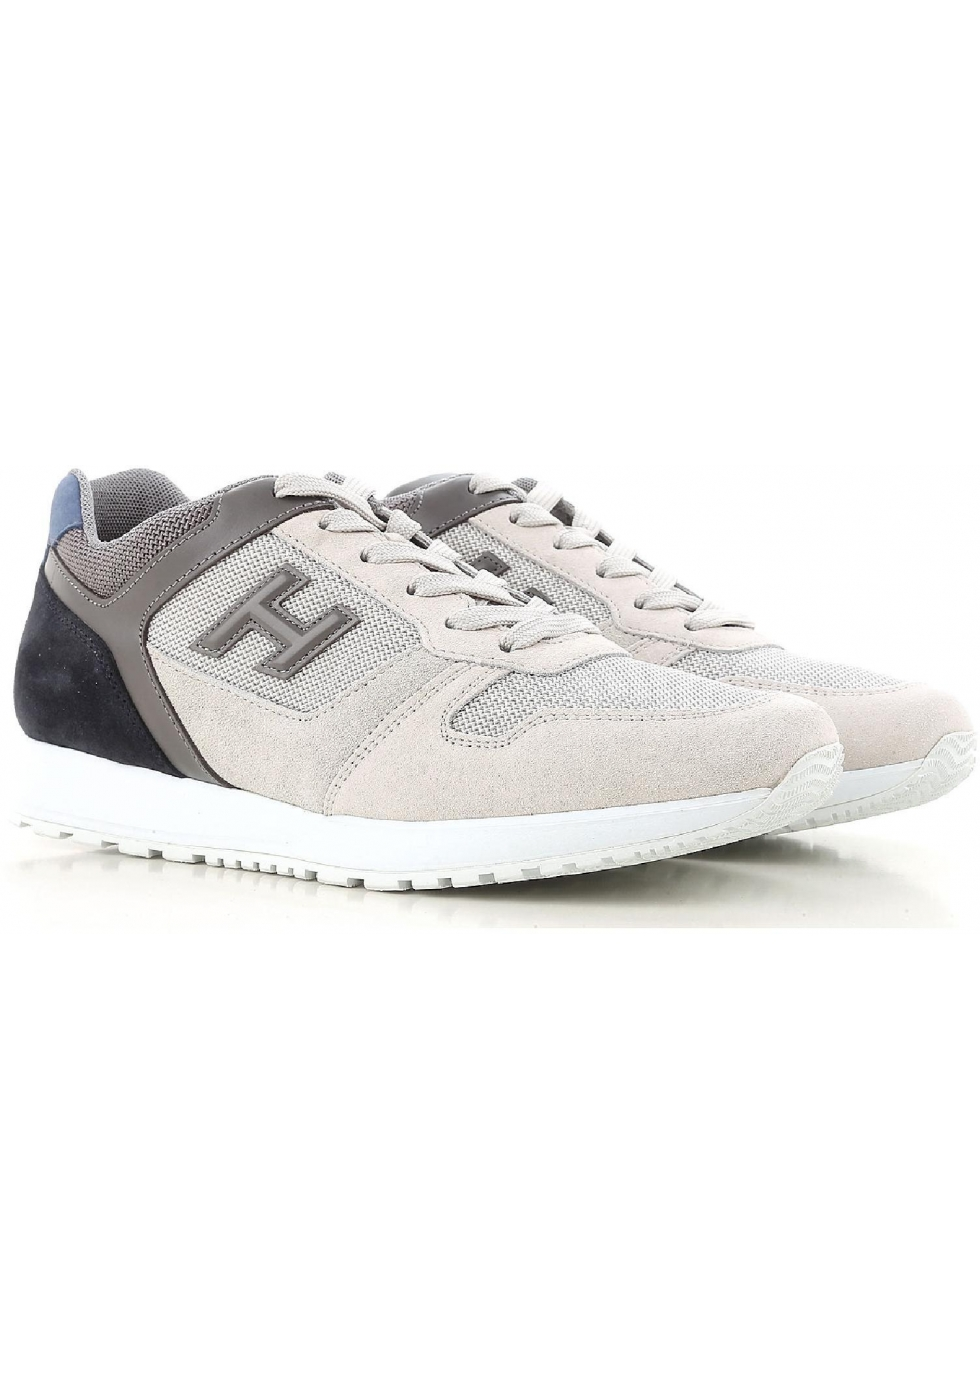 Sneakers Hogan uomo in pelle grigio e bianco sporco - Italian Boutique